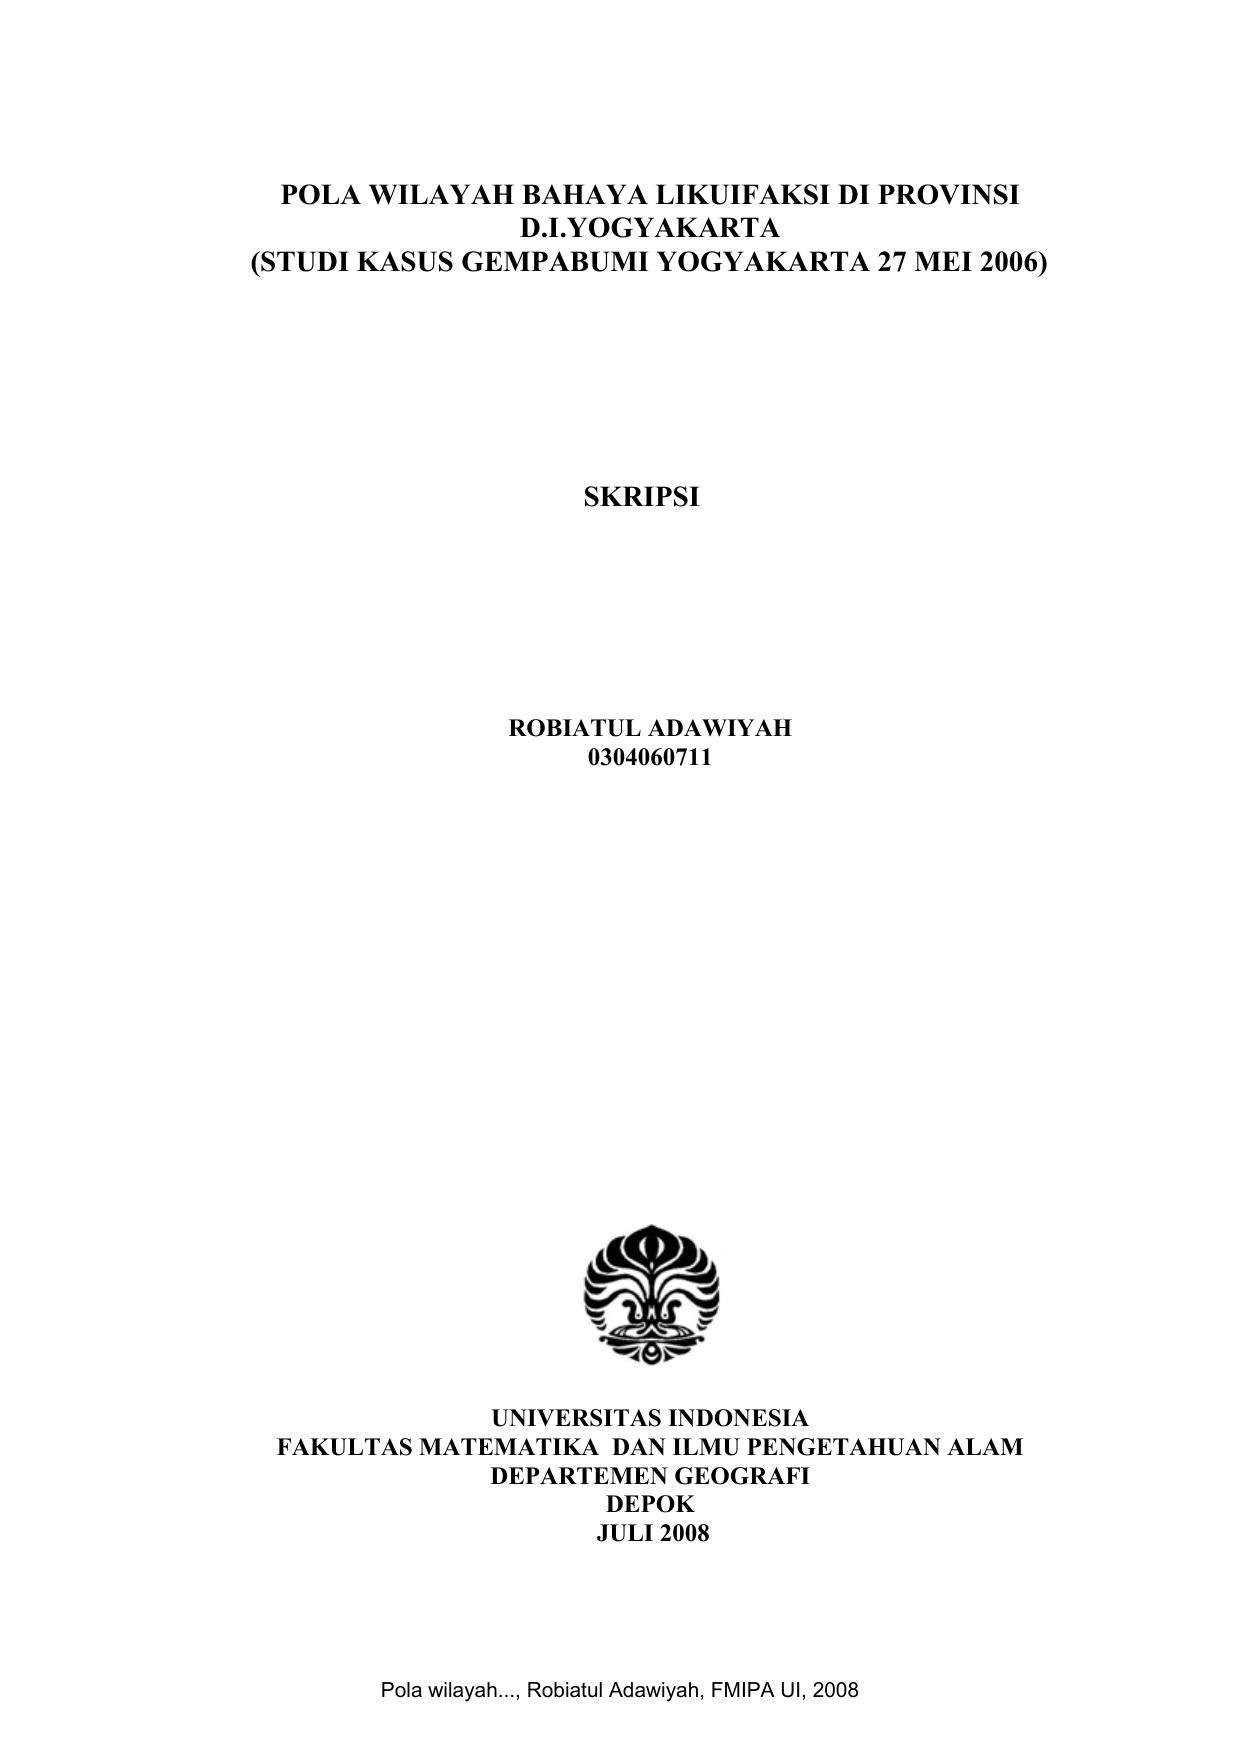 Studi Kasus Gempabumi Yogyakarta 27 Mei 2006 Skripsi